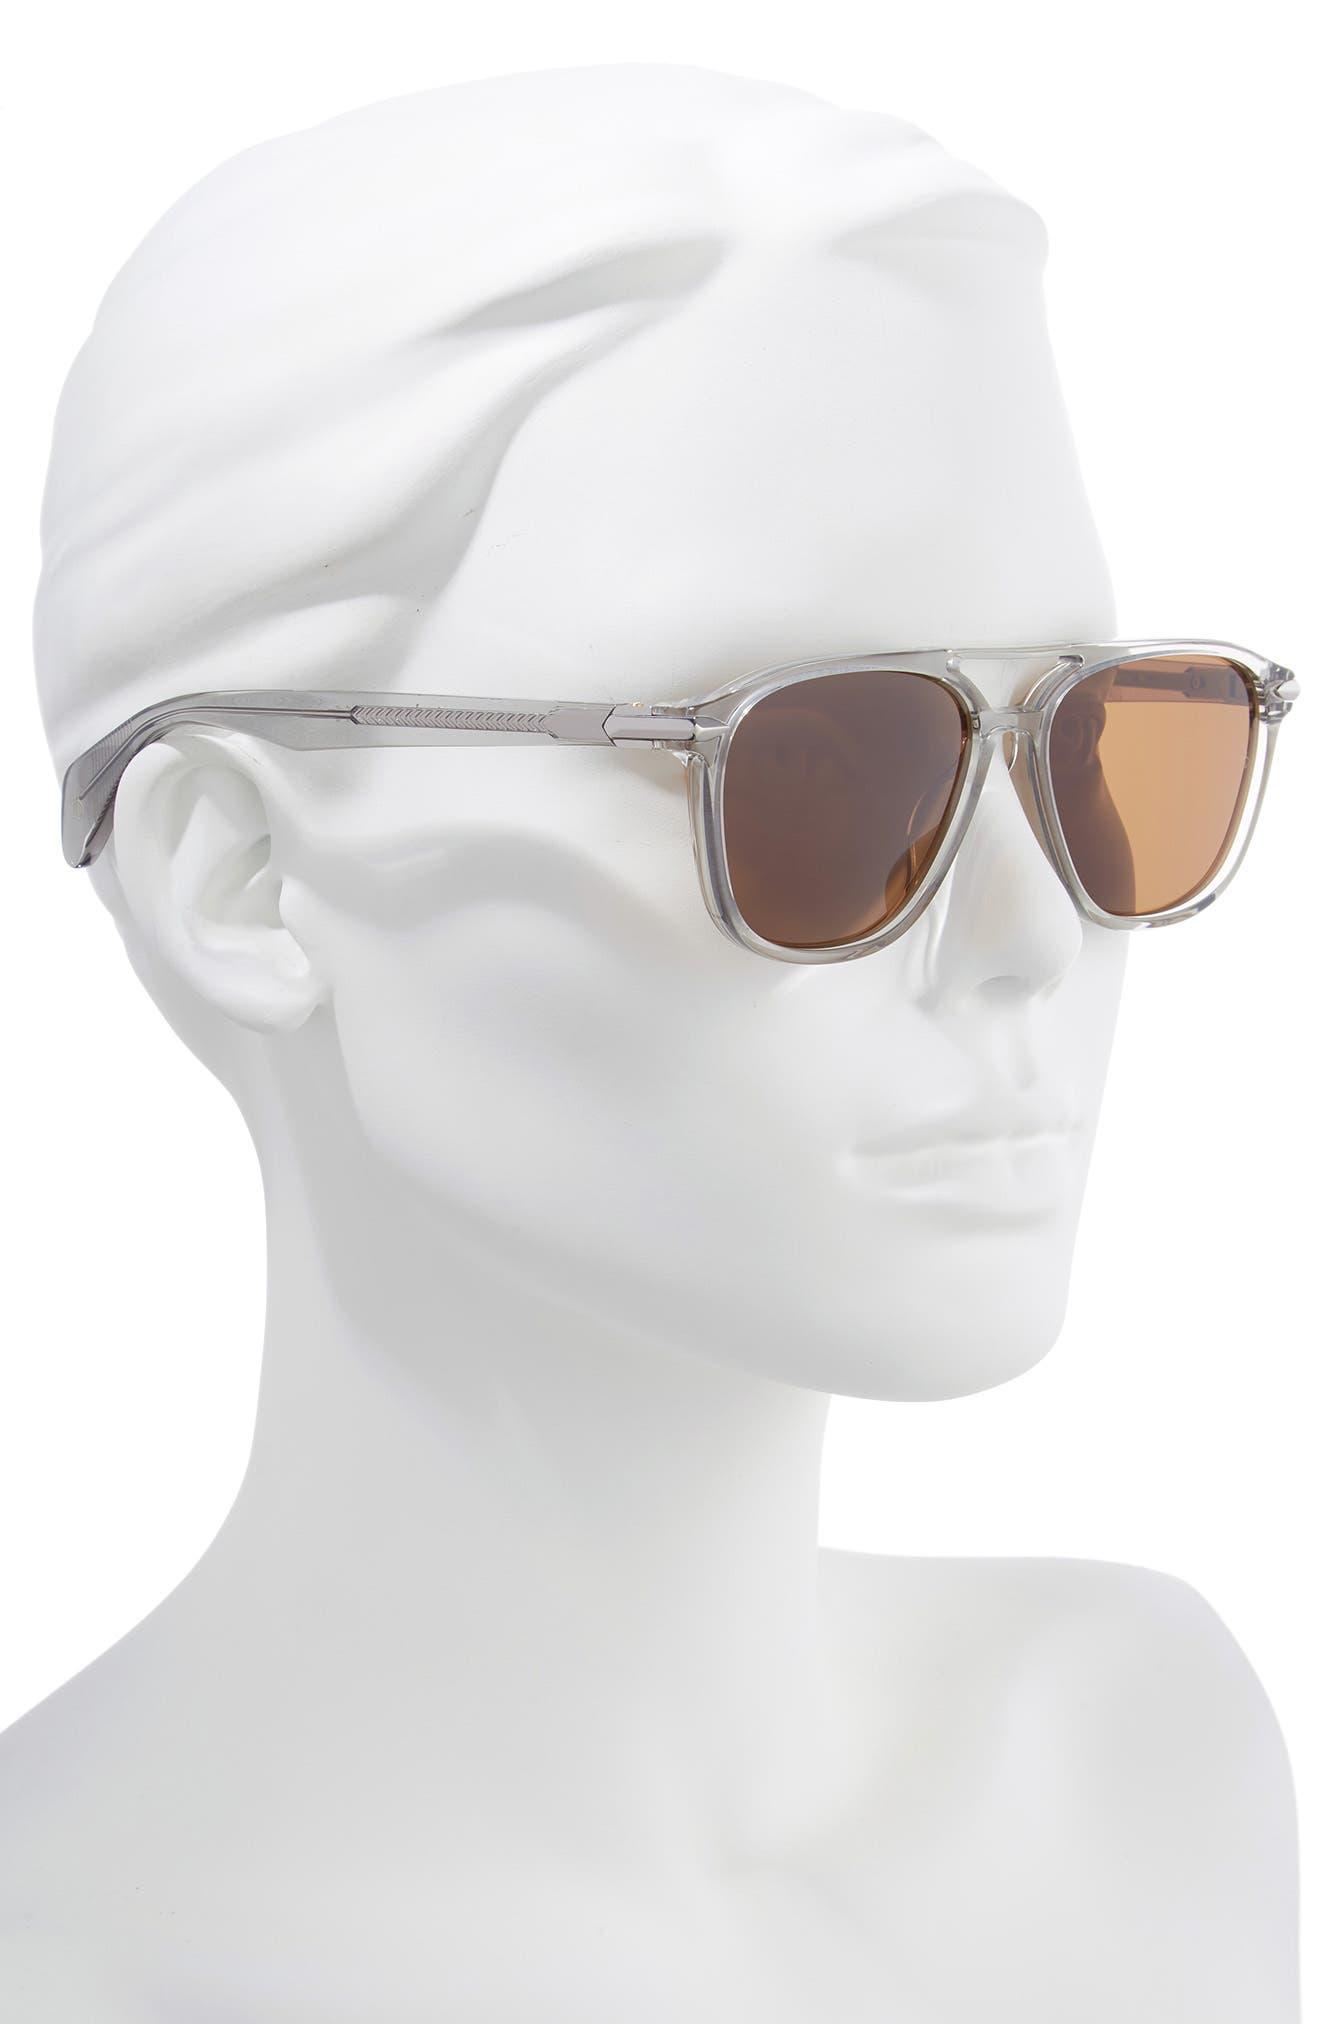 54mm Aviator Sunglasses,                             Alternate thumbnail 2, color,                             GREY